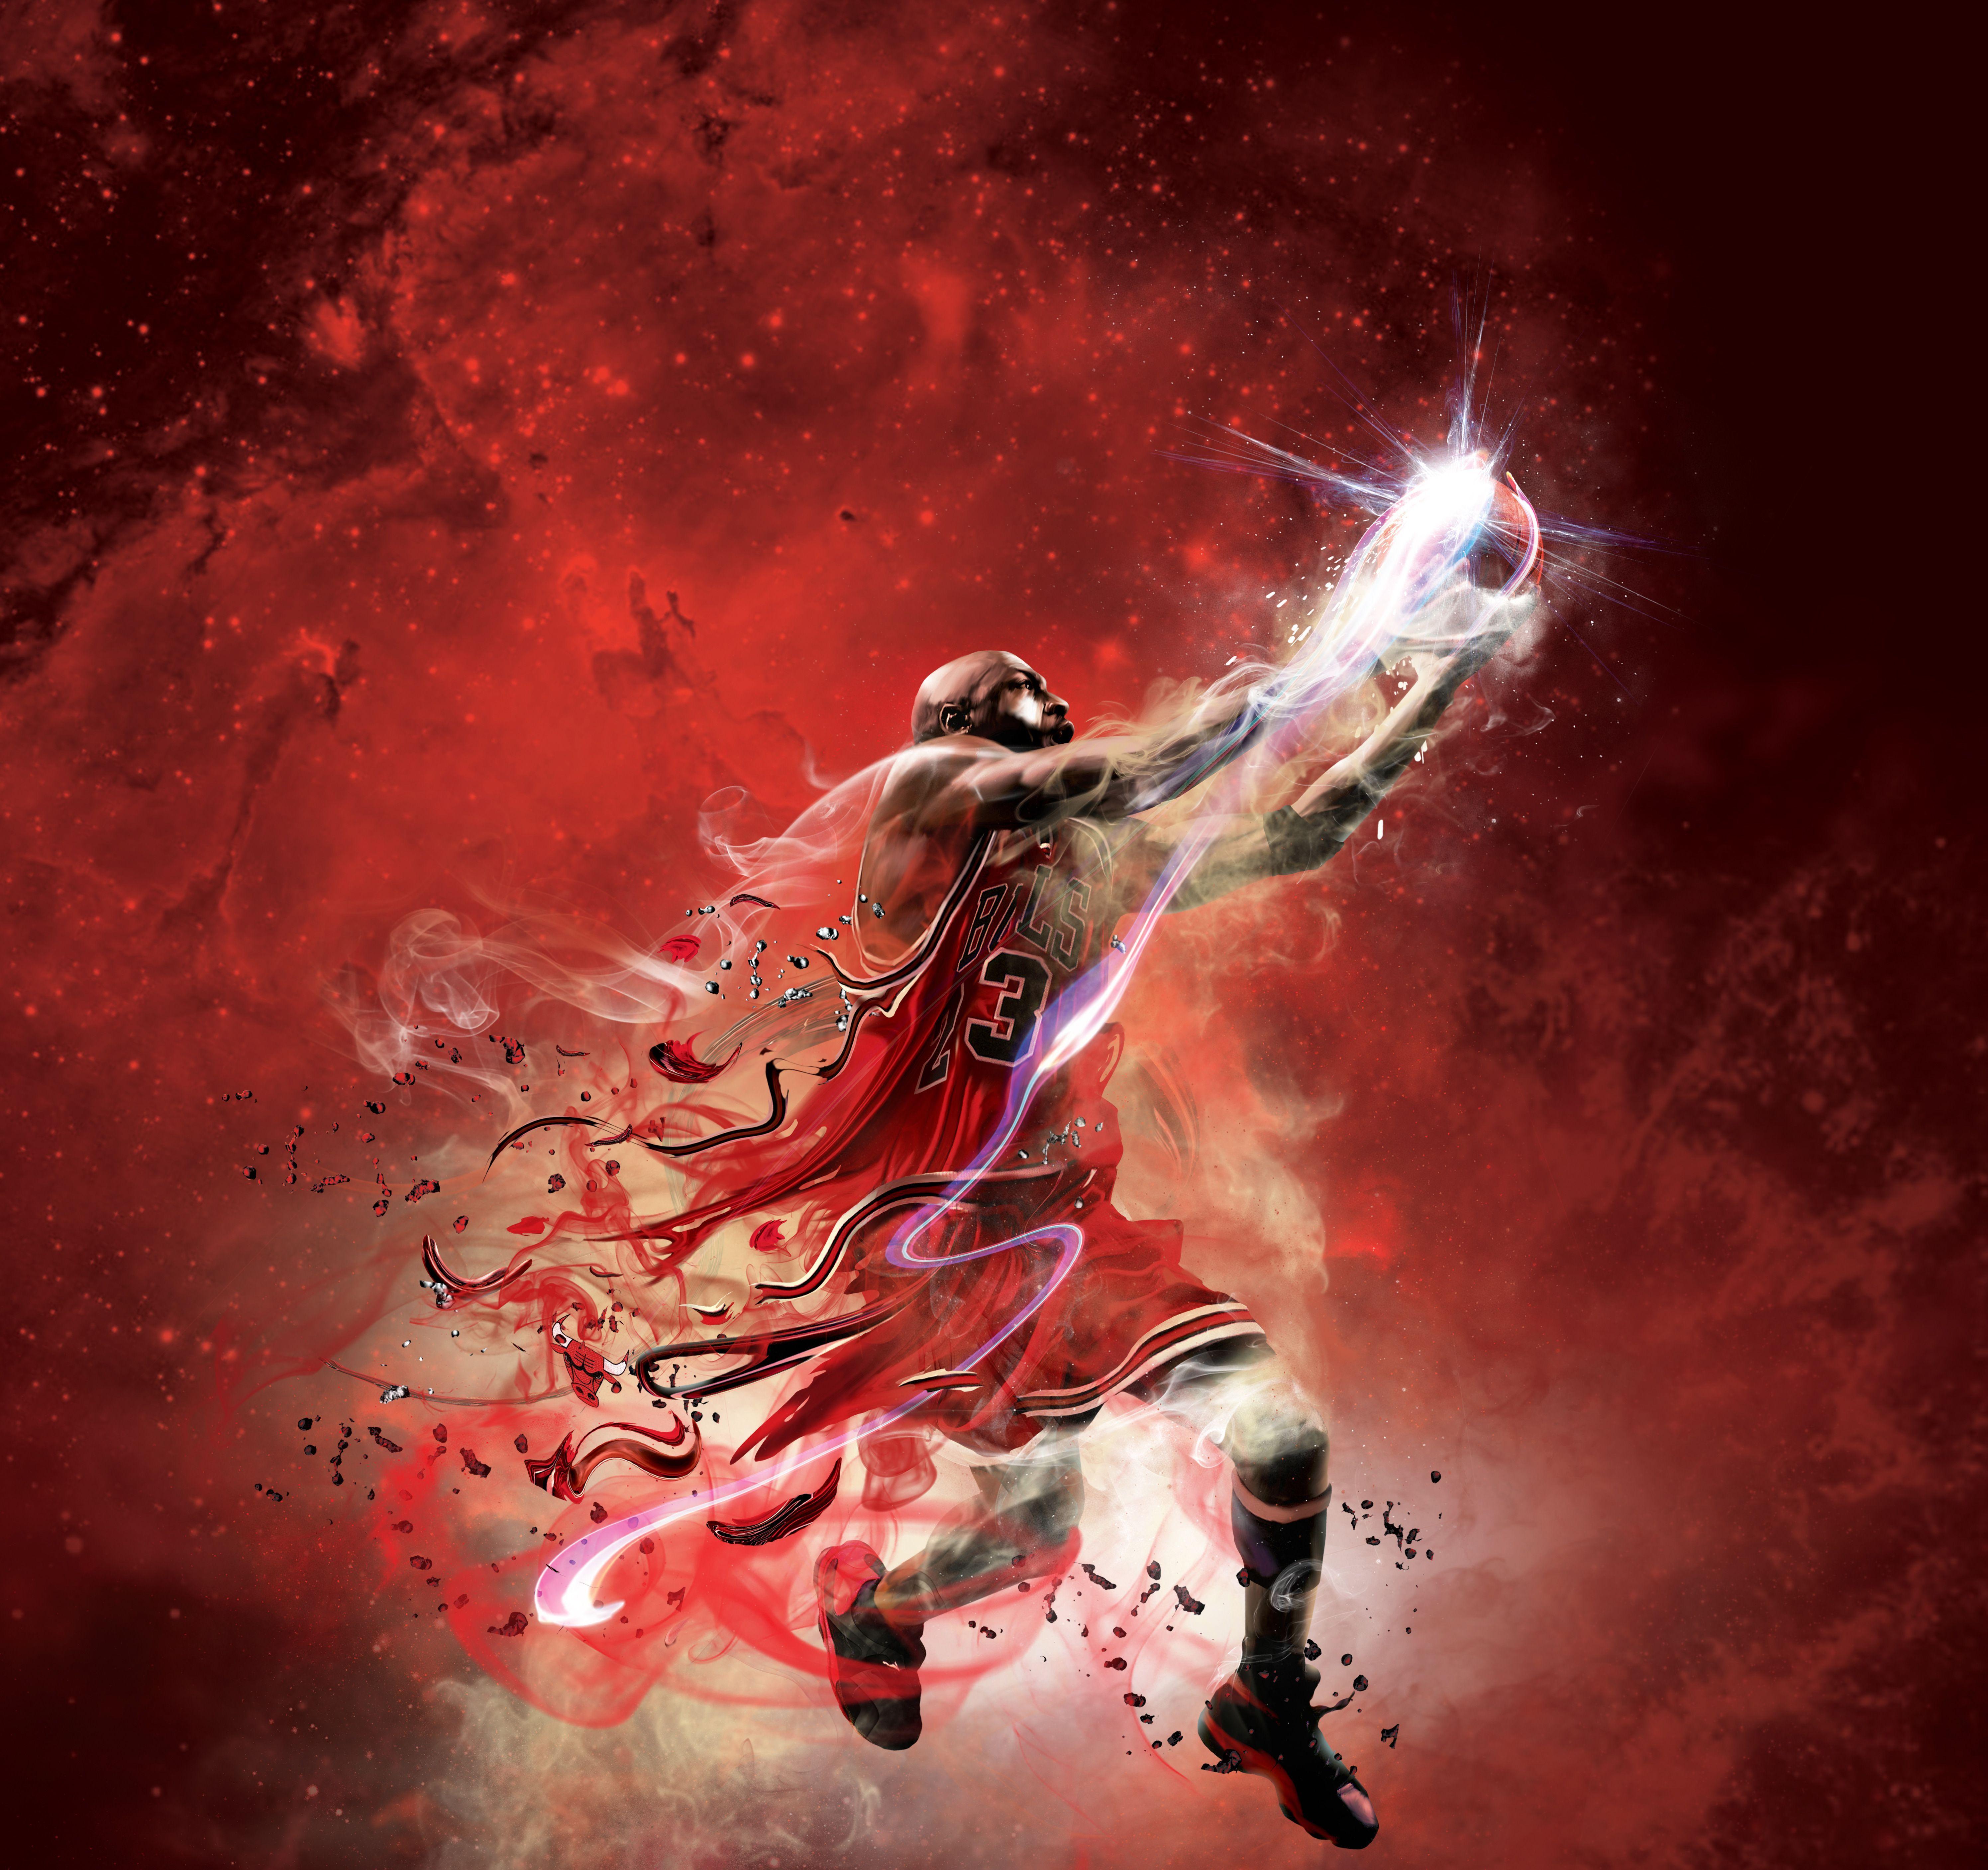 4K NBA Wallpapers   Top 4K NBA Backgrounds   WallpaperAccess 5983x5627